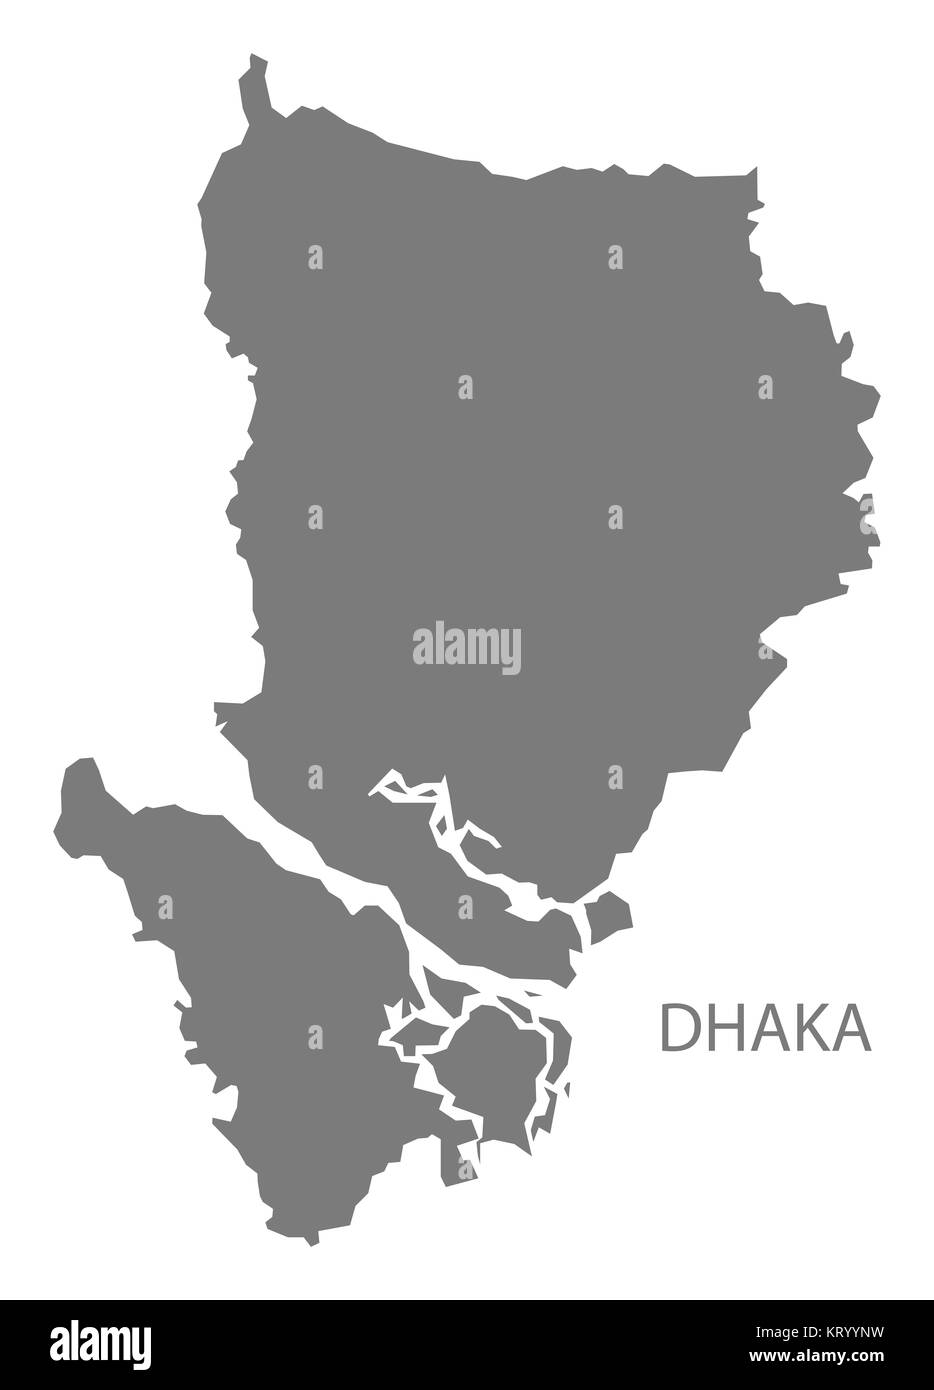 Dhaka Bangladesh Map grey Stock Photo: 169644885 - Alamy